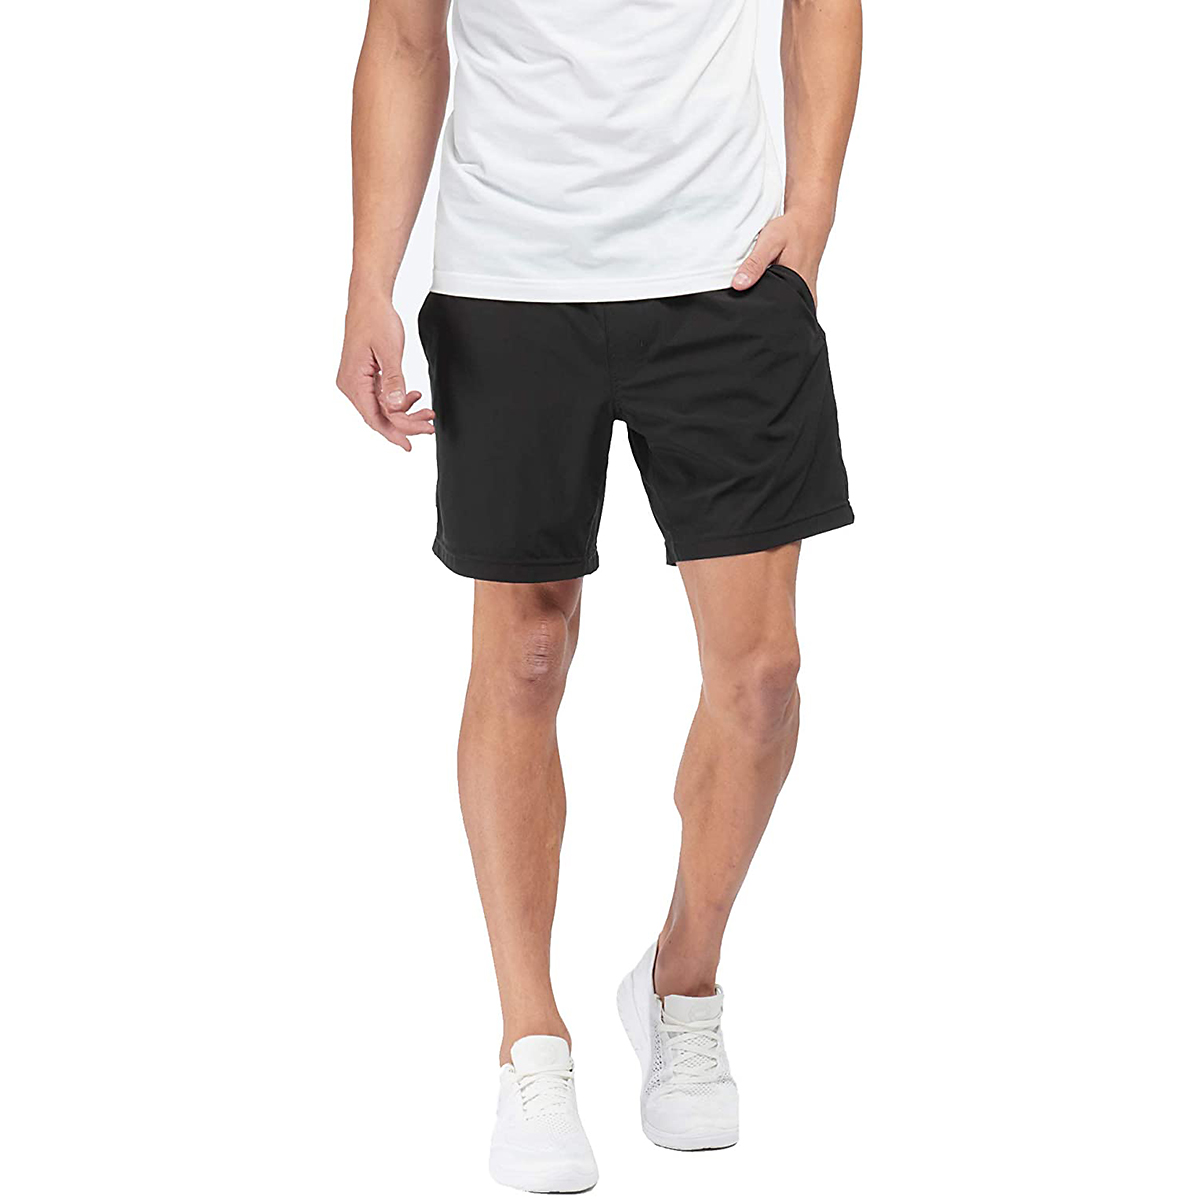 "Men's Rhone 7"" Mako Lined Short, , large, image 1"